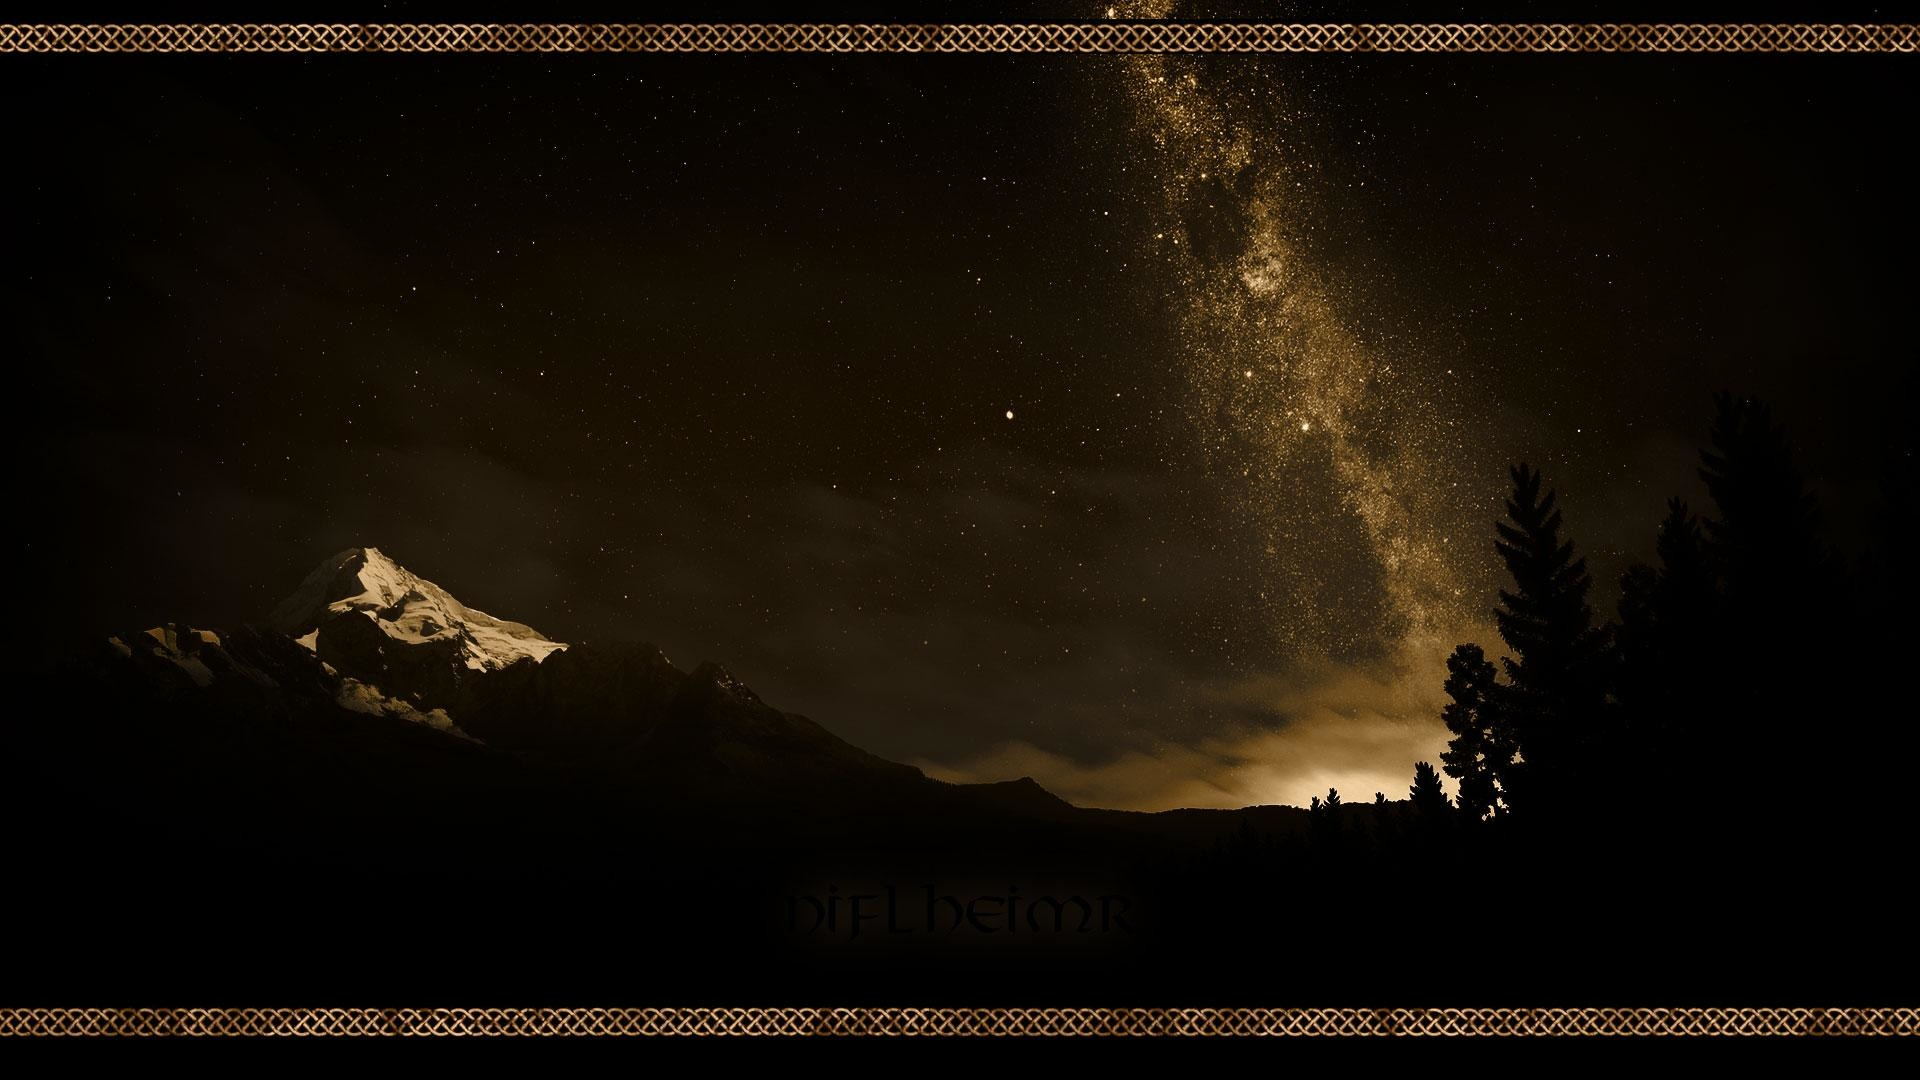 pagan wallpaper for desktop 55 images